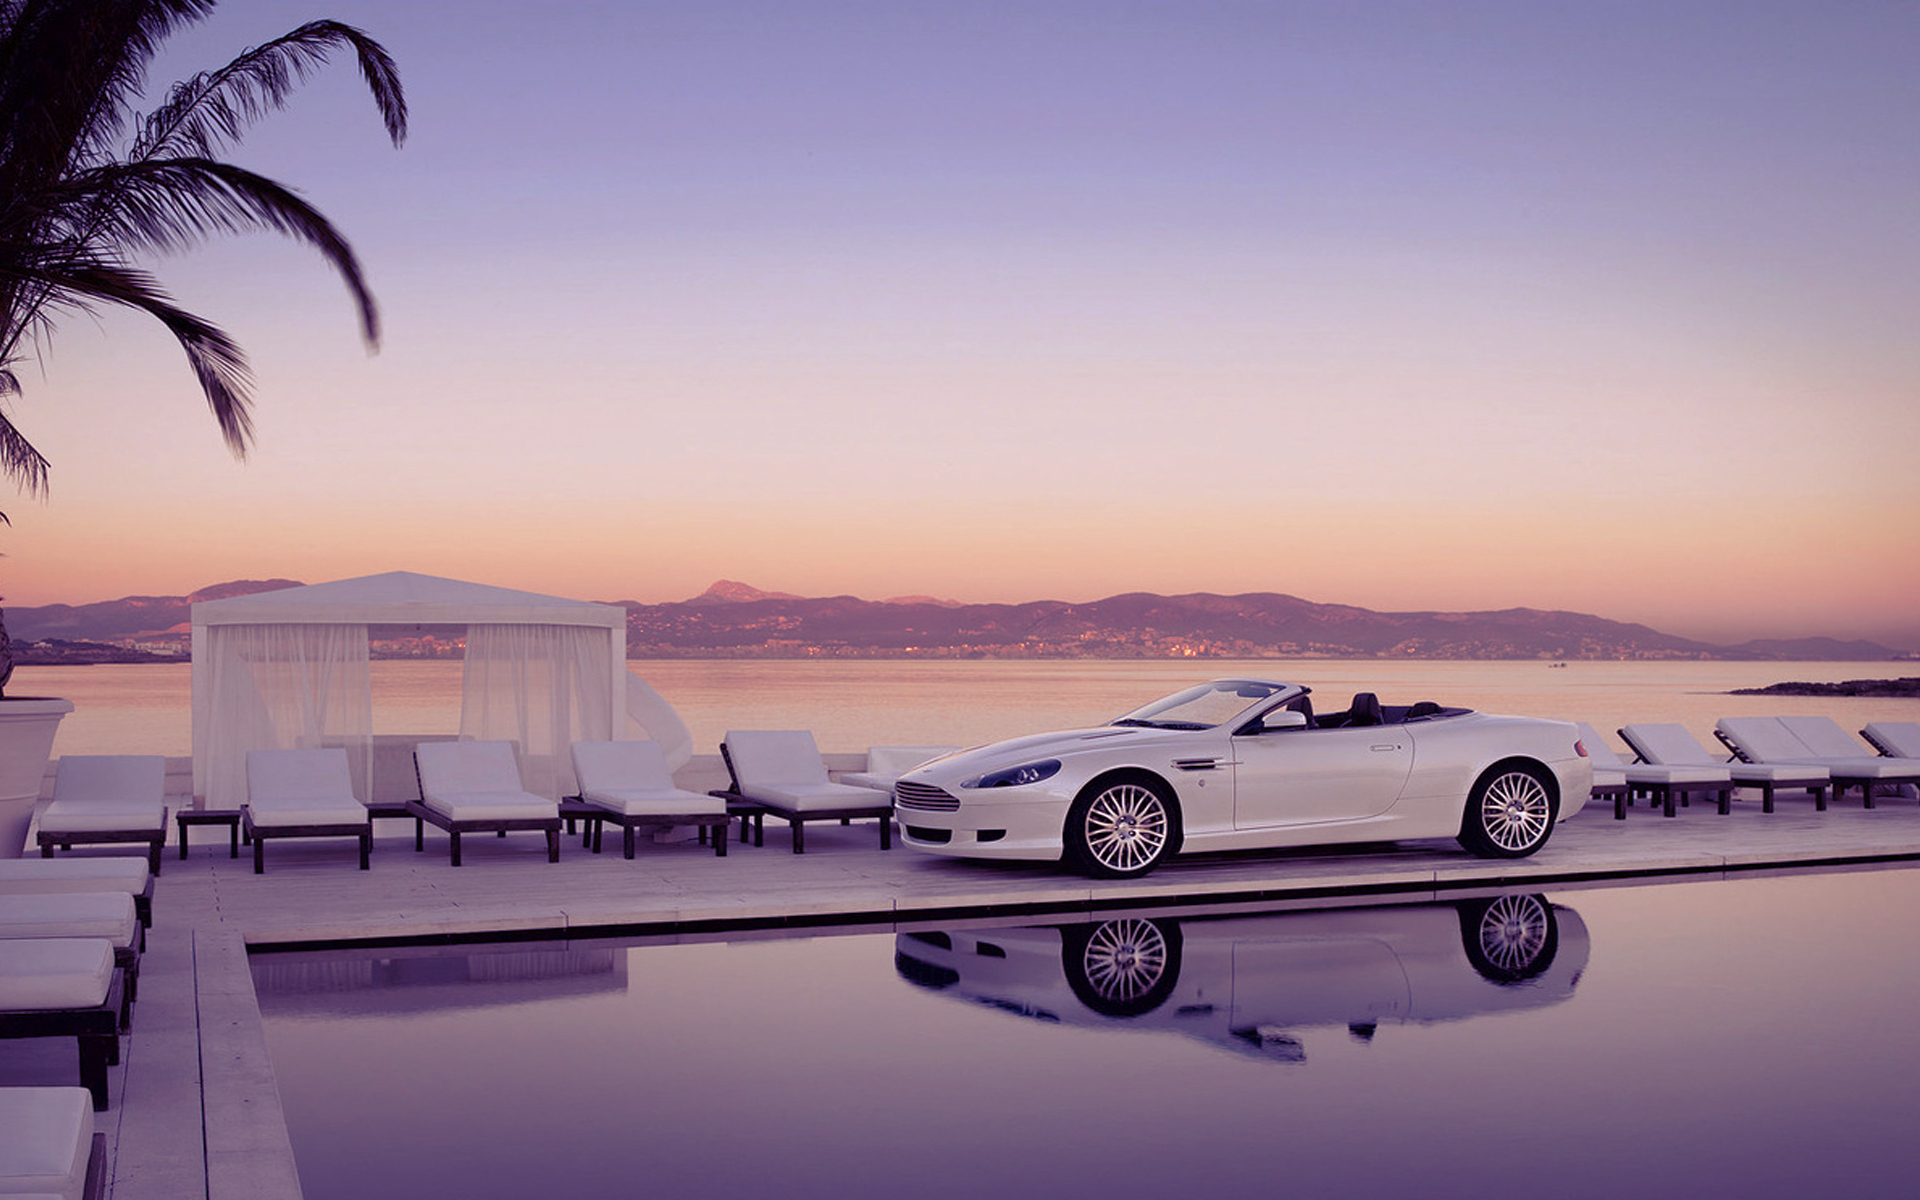 Motivational Quotes Iphone 7 Wallpaper Aston Martin Db9 Volante Fond D 233 Cran Hd Arri 232 Re Plan